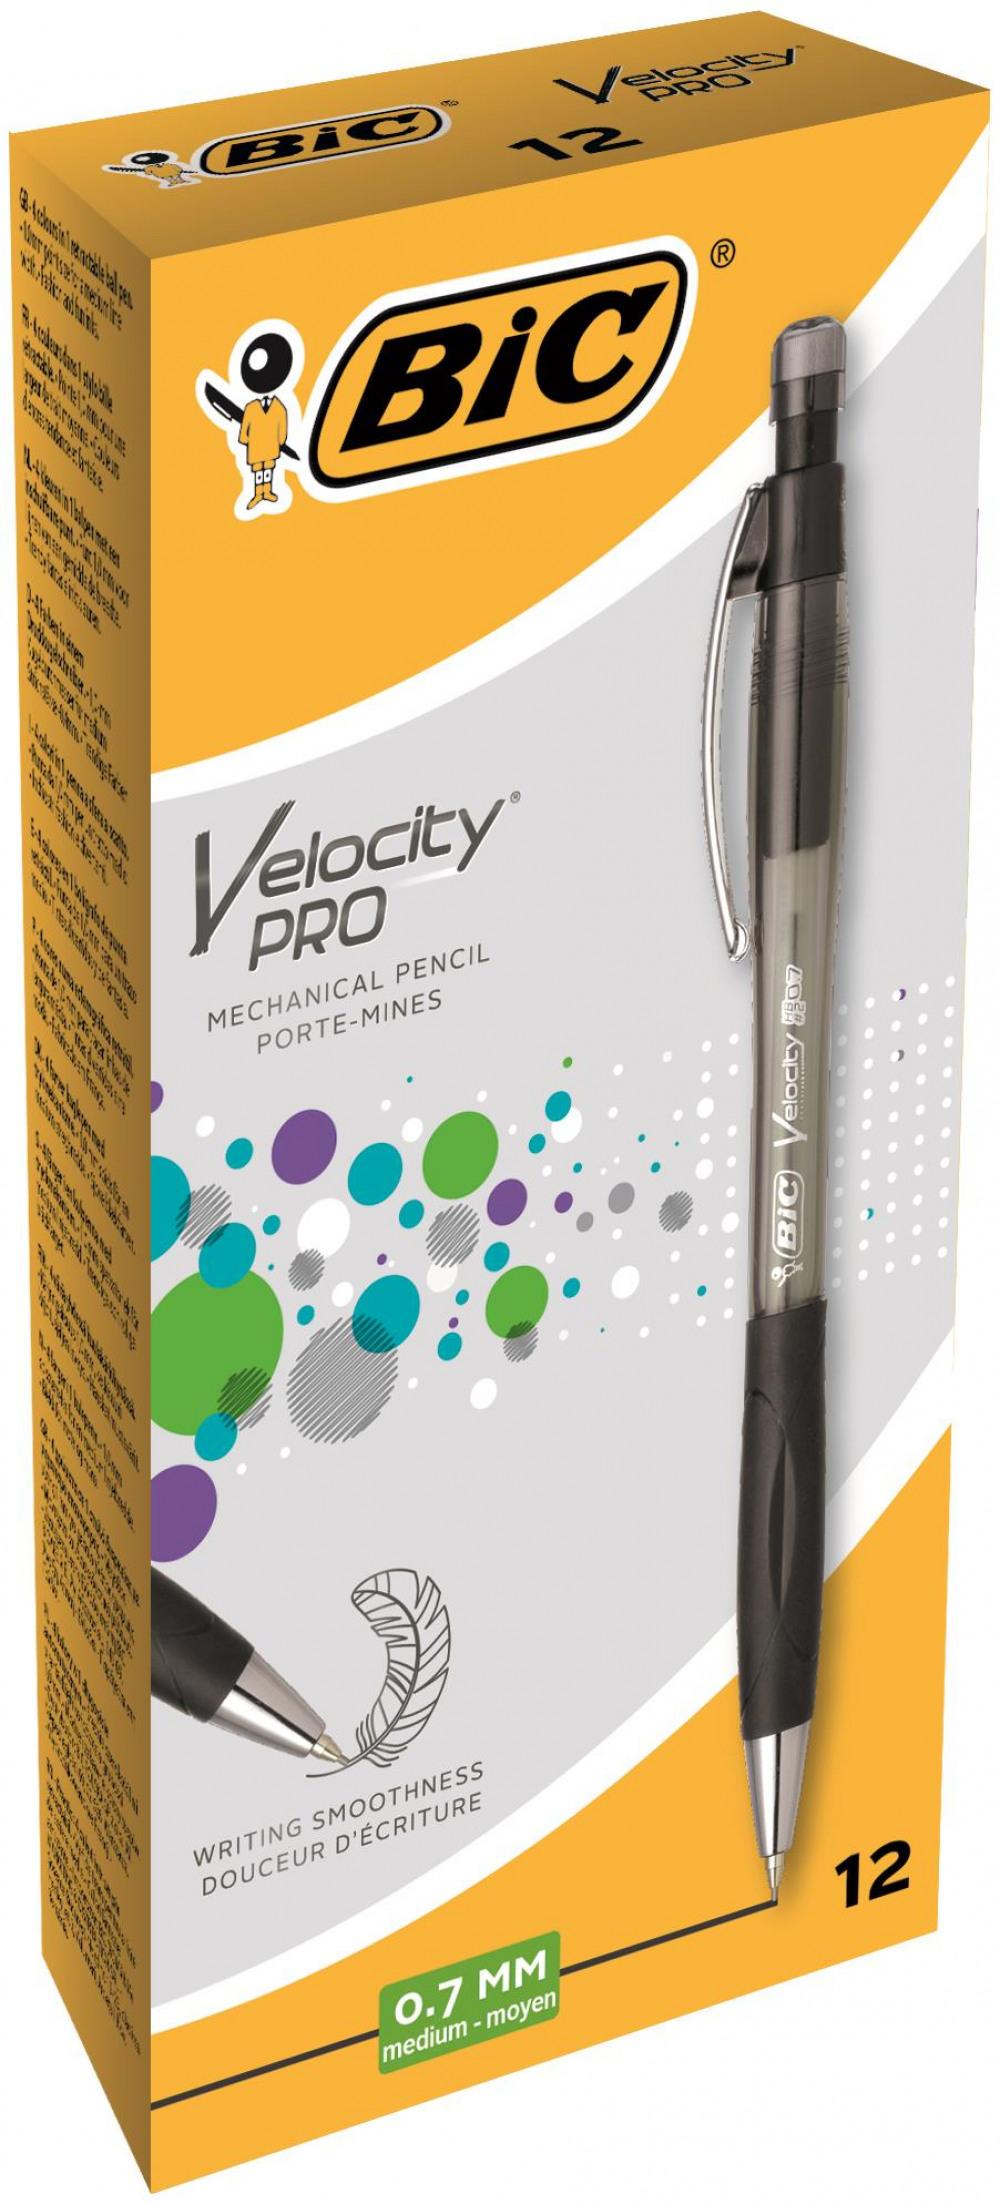 Bic Velocity Pro Mech Pencil 0 7mm Lead